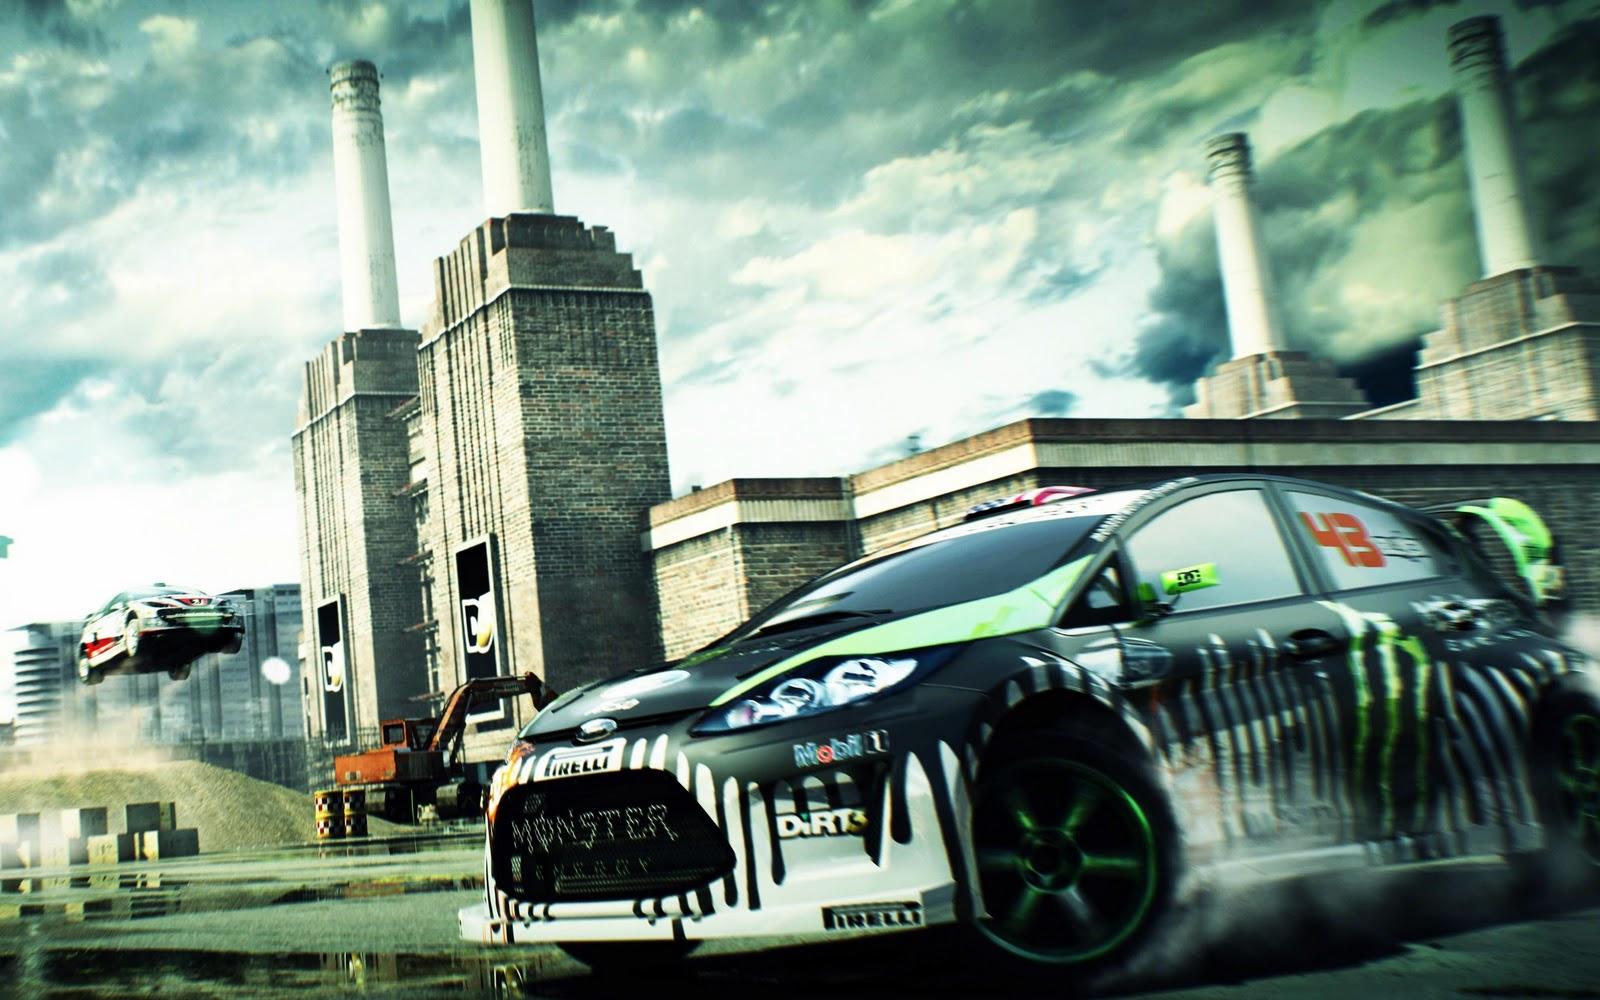 http://4.bp.blogspot.com/-ZpH7MaWY_Pw/Tot9WVwZYMI/AAAAAAAAEHo/IIRW9wO-jzM/s1600/dirt_3_race_monster-wide.jpg